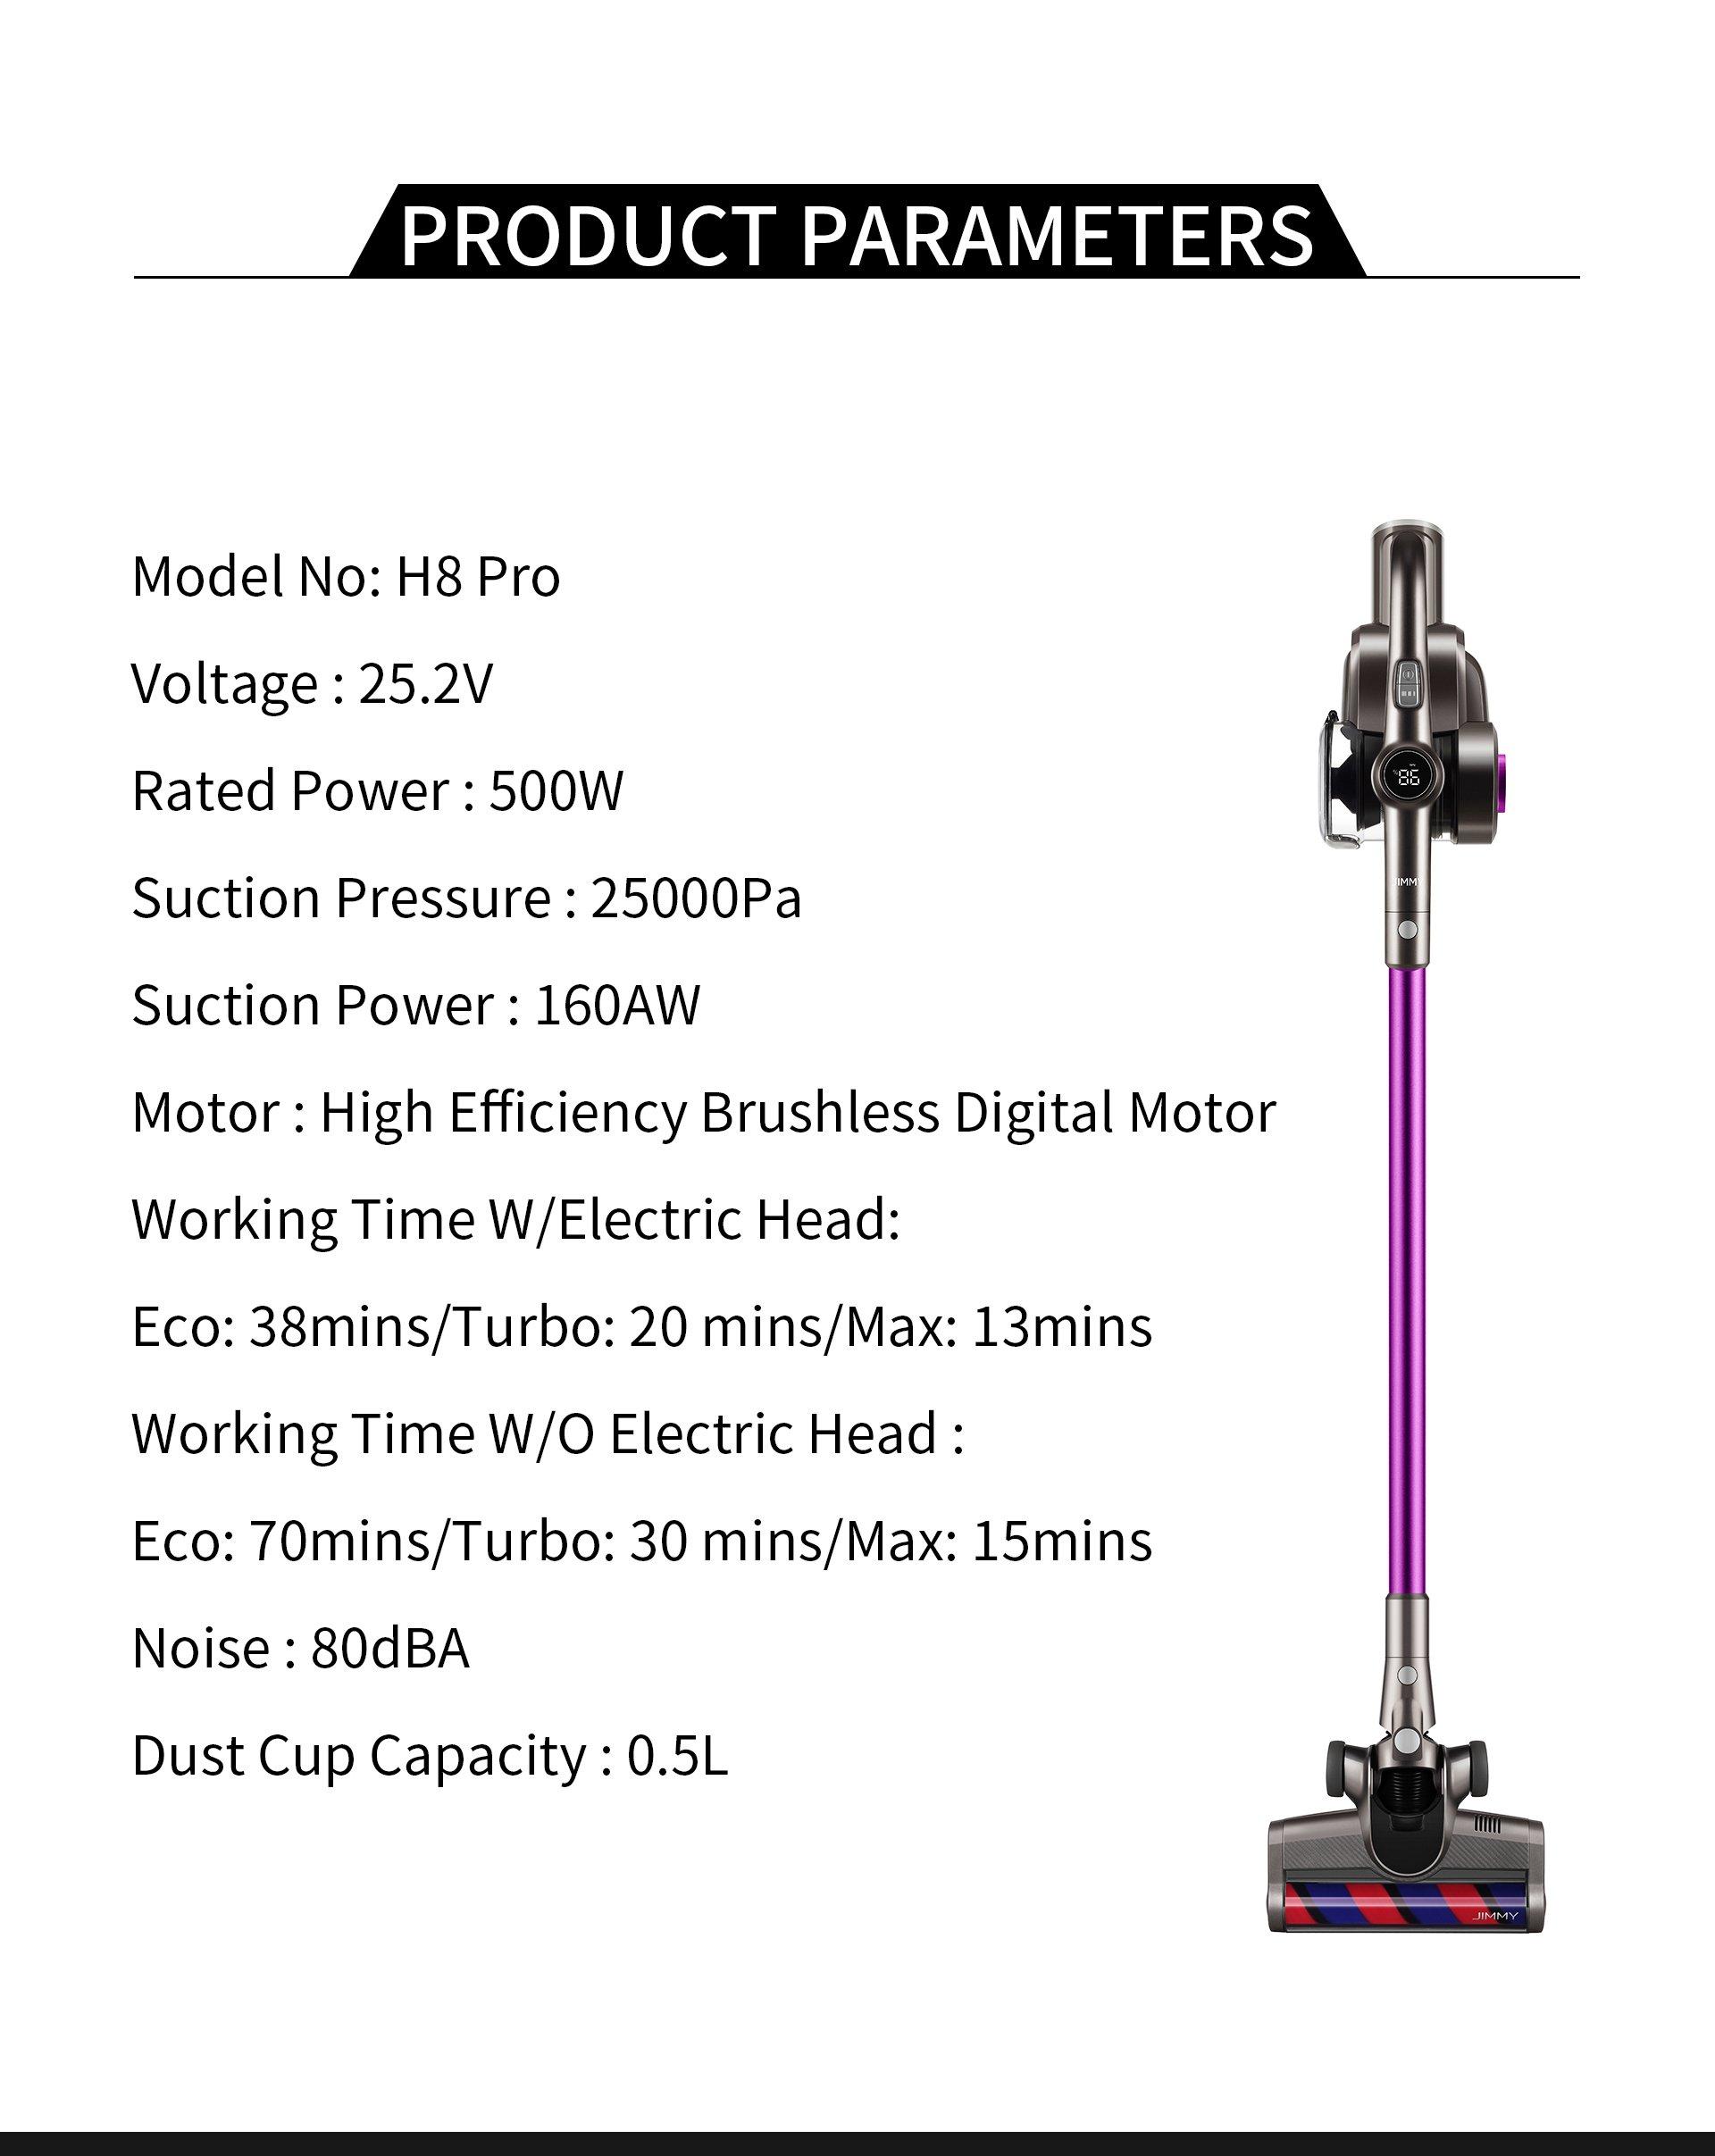 Specifikacije produkta